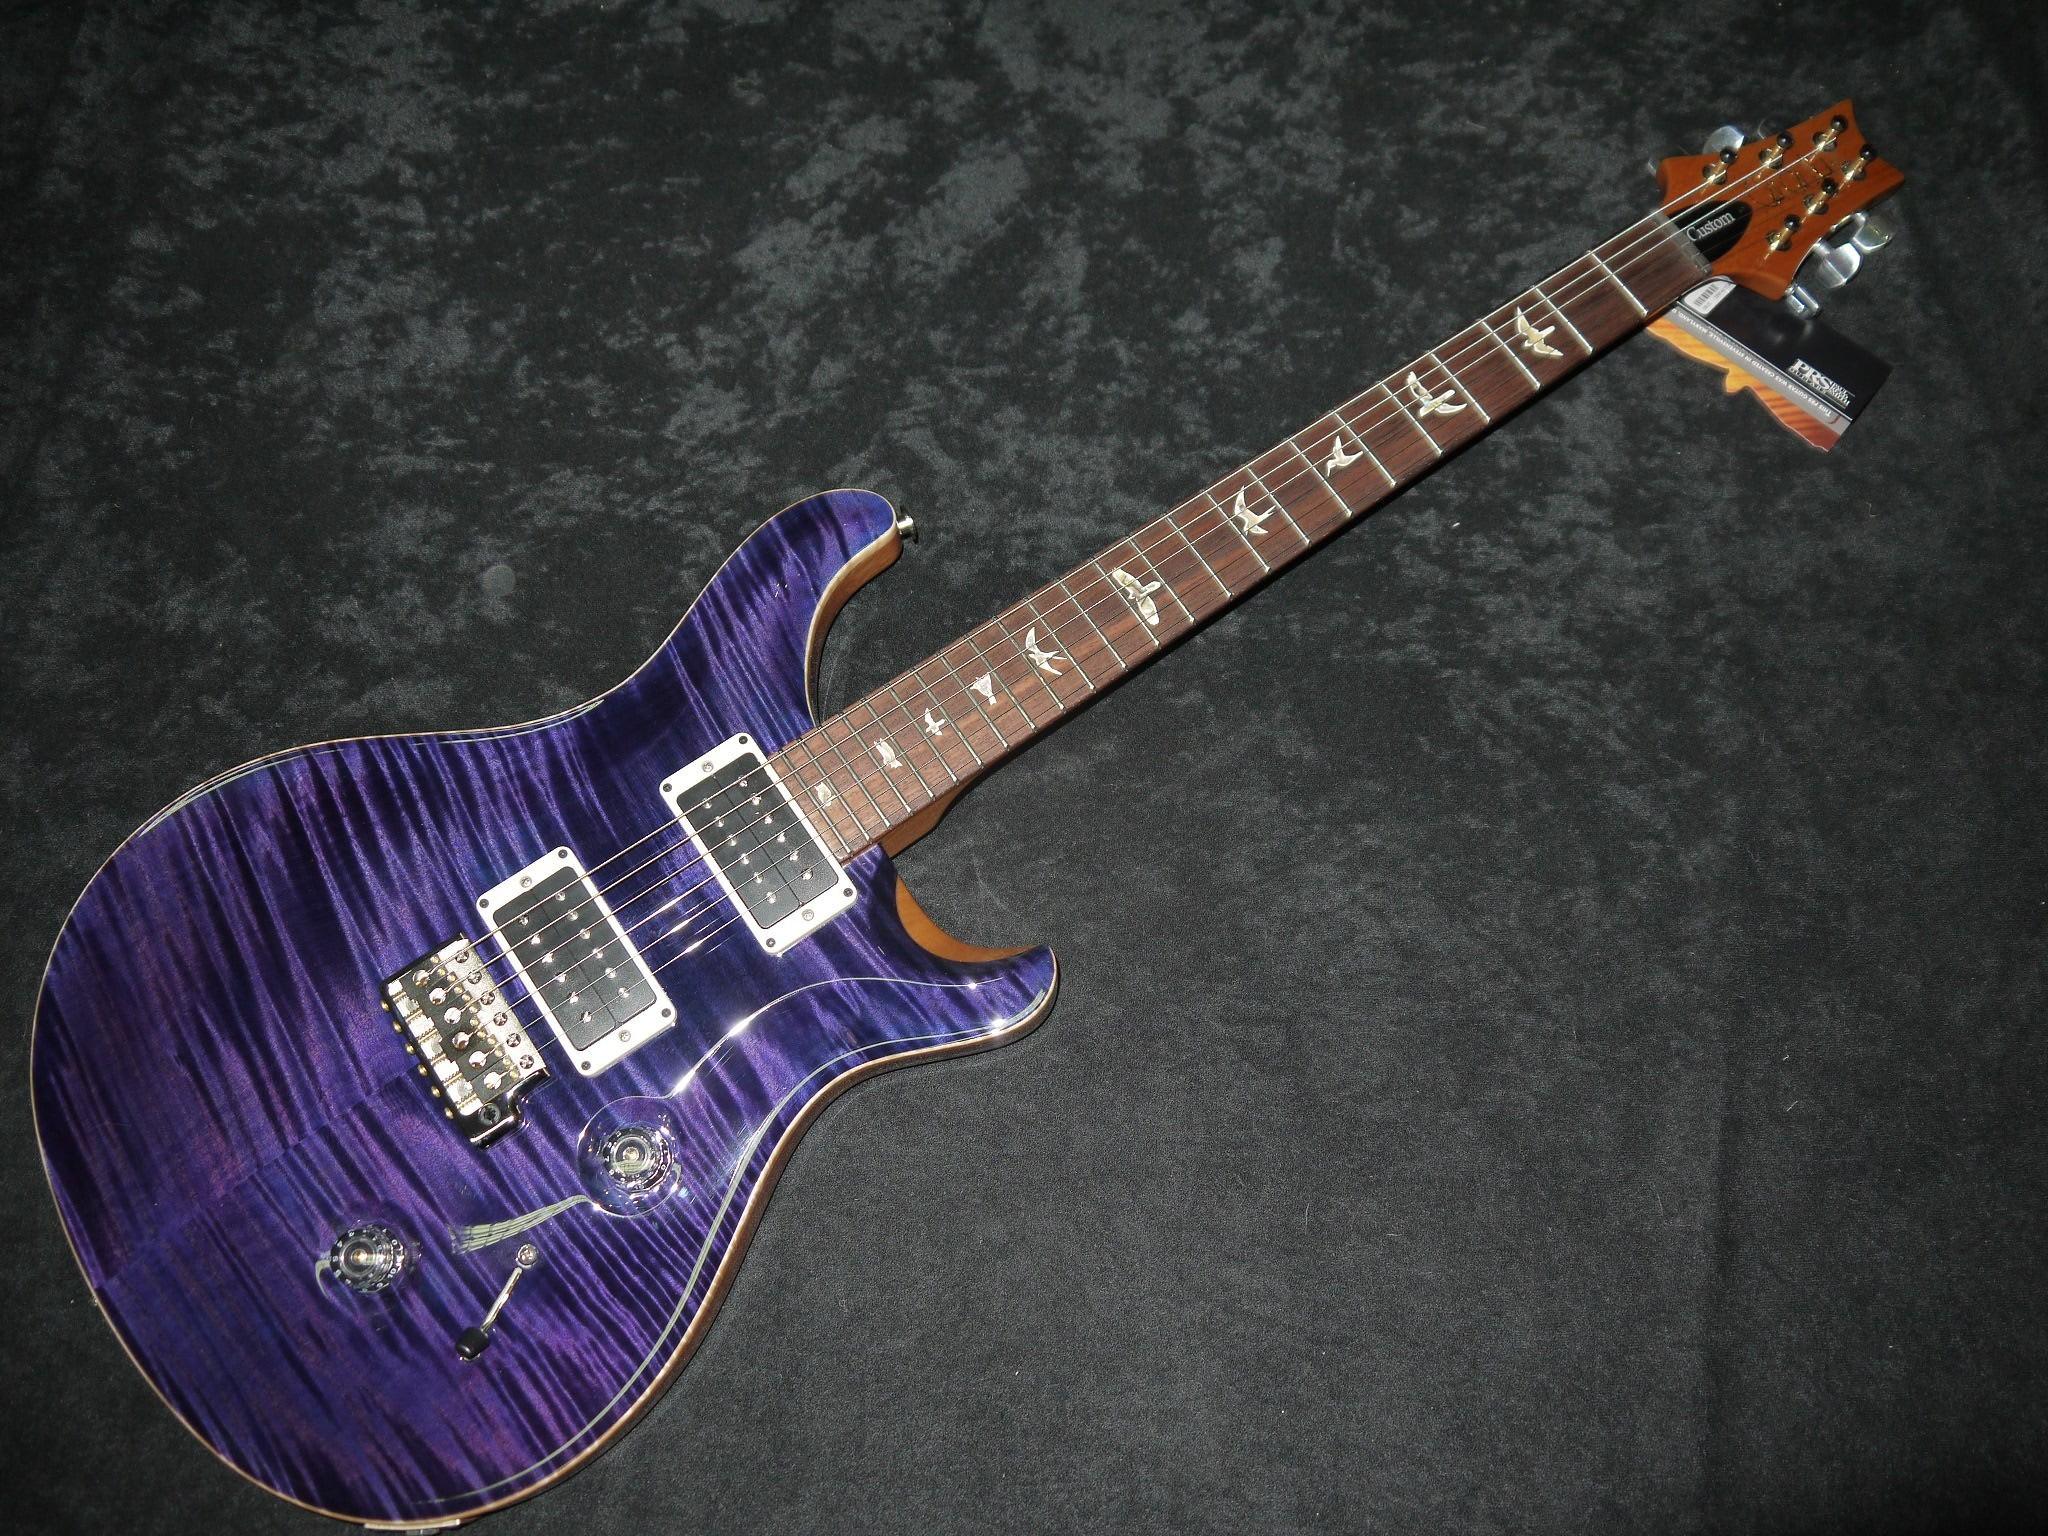 Filename: original.jpg · view image. Found on: paul reed smith guitars  wallpaper